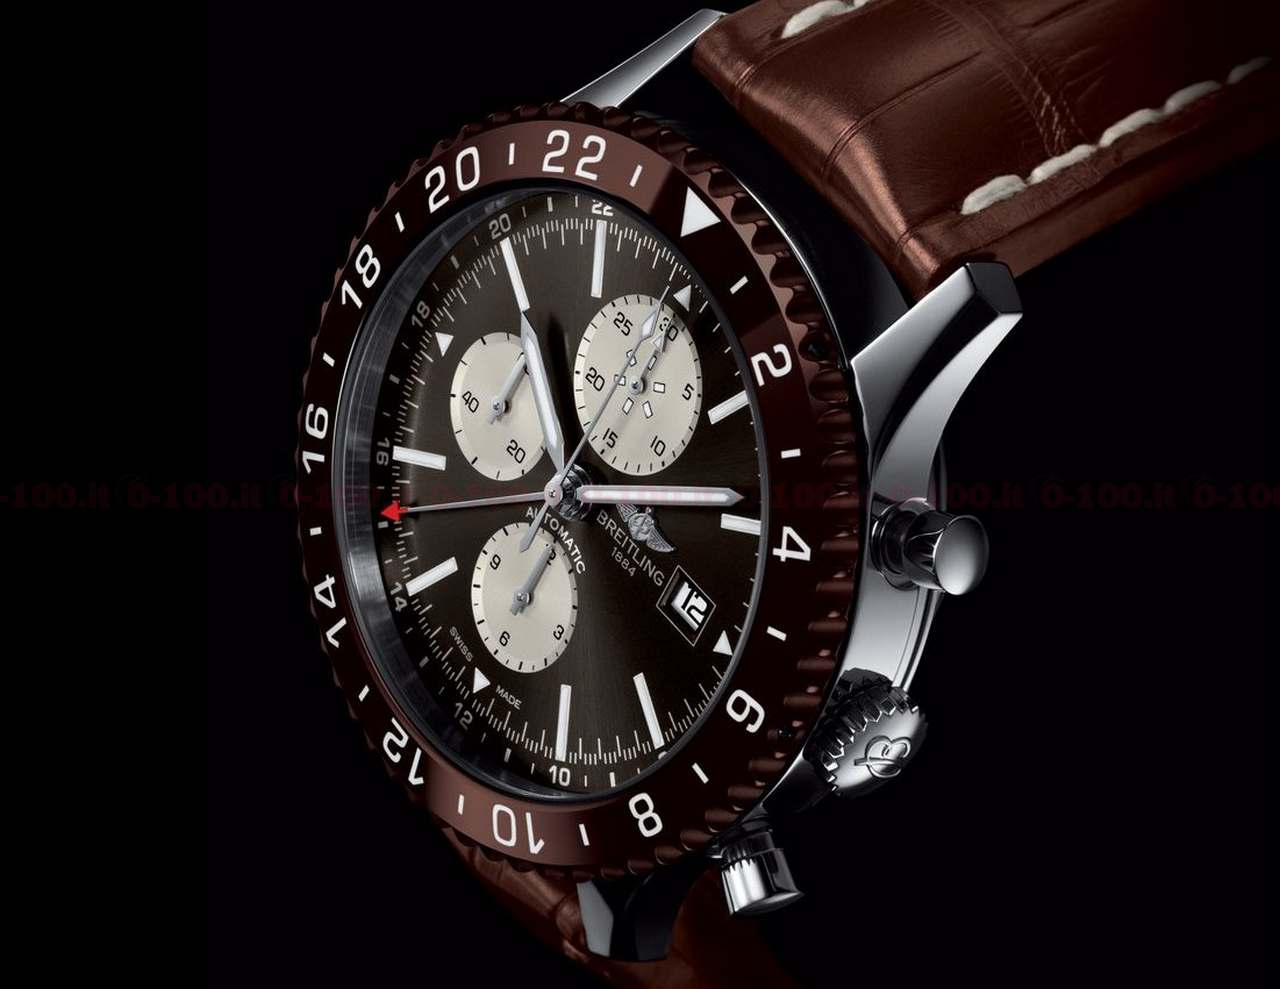 Breitling Chronoliner Ref. Y2431033Q621443XA20BA.1_0-100_price_0-1001